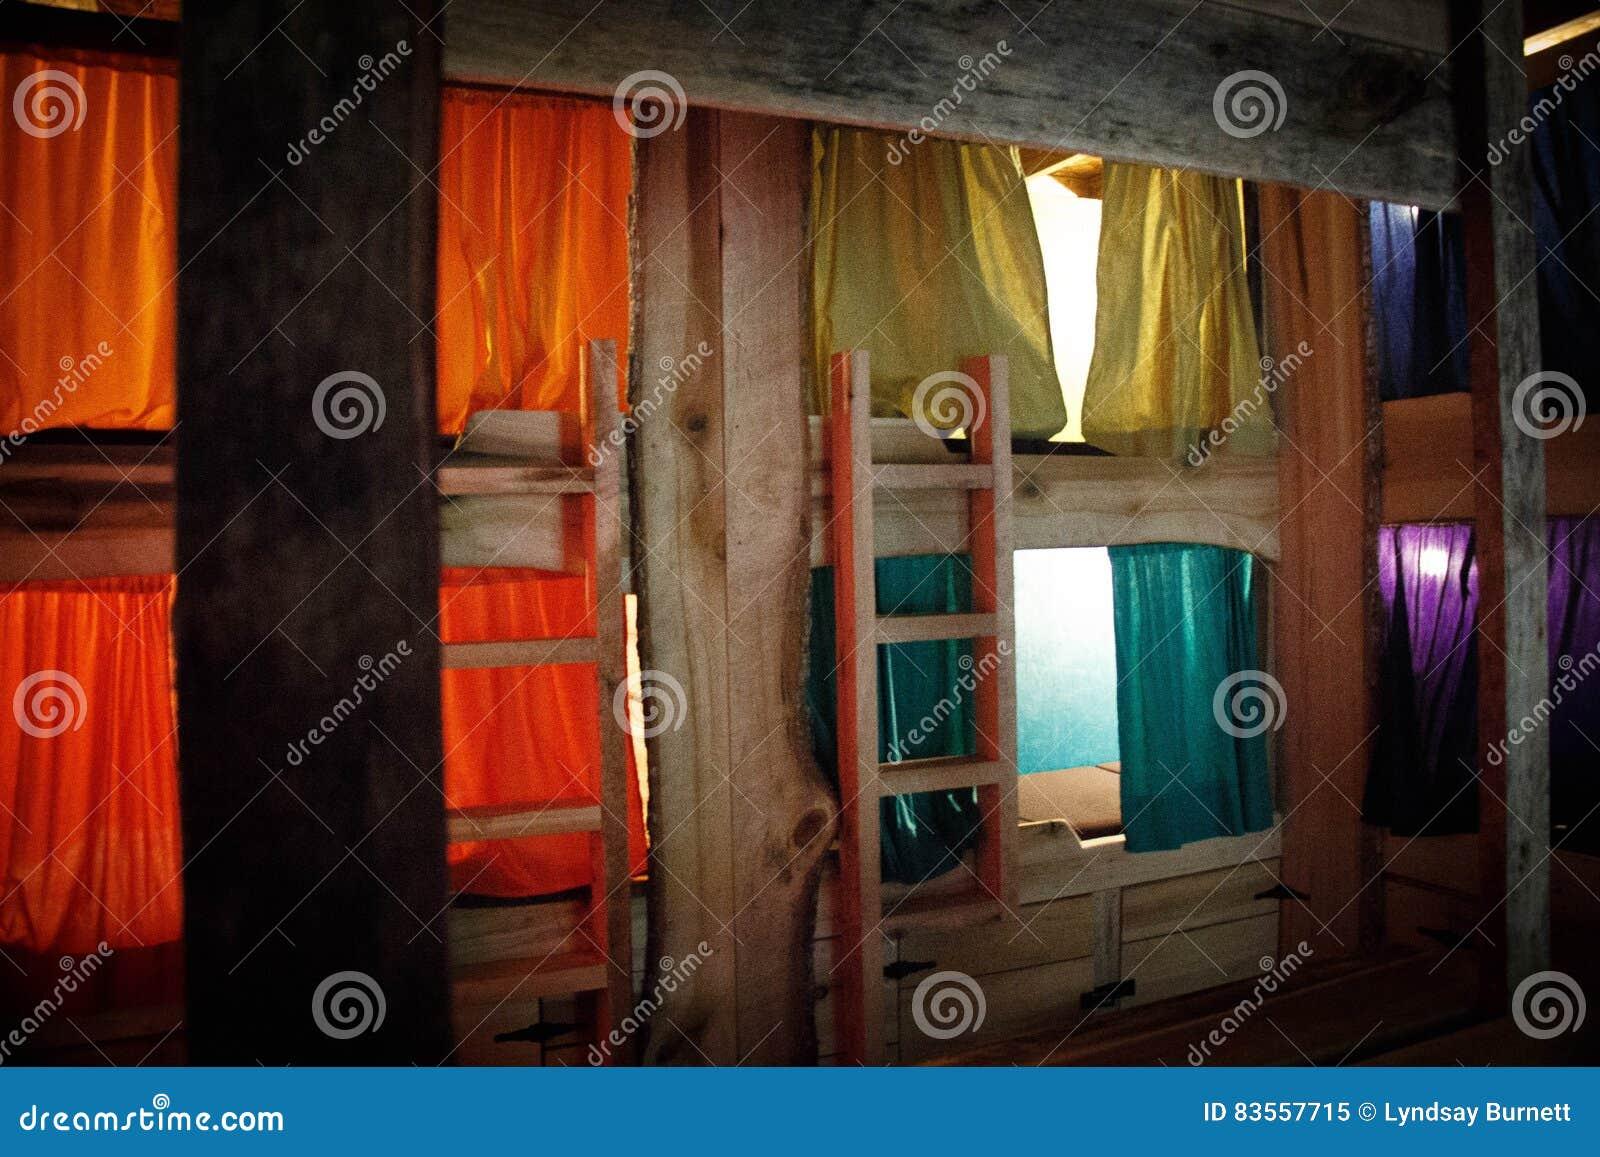 Lits Superposes Rustiques Colores Image Stock Image Du Royal